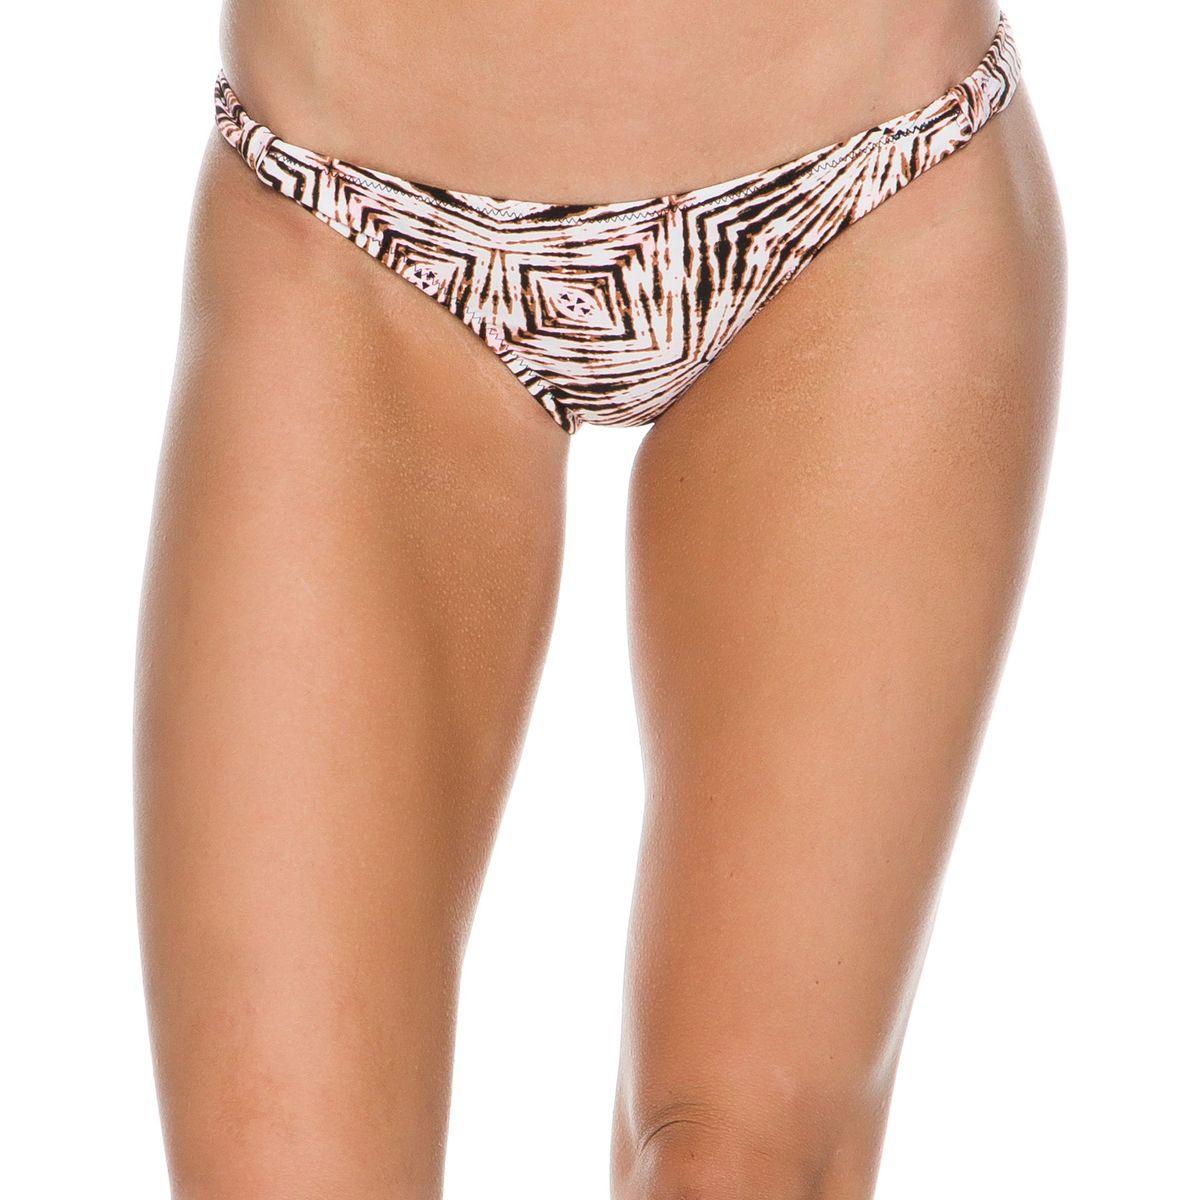 00c49346752 Volcom-Womens-Lost-Sea-Skimpy-Bikini-Bottom thumbnail 9